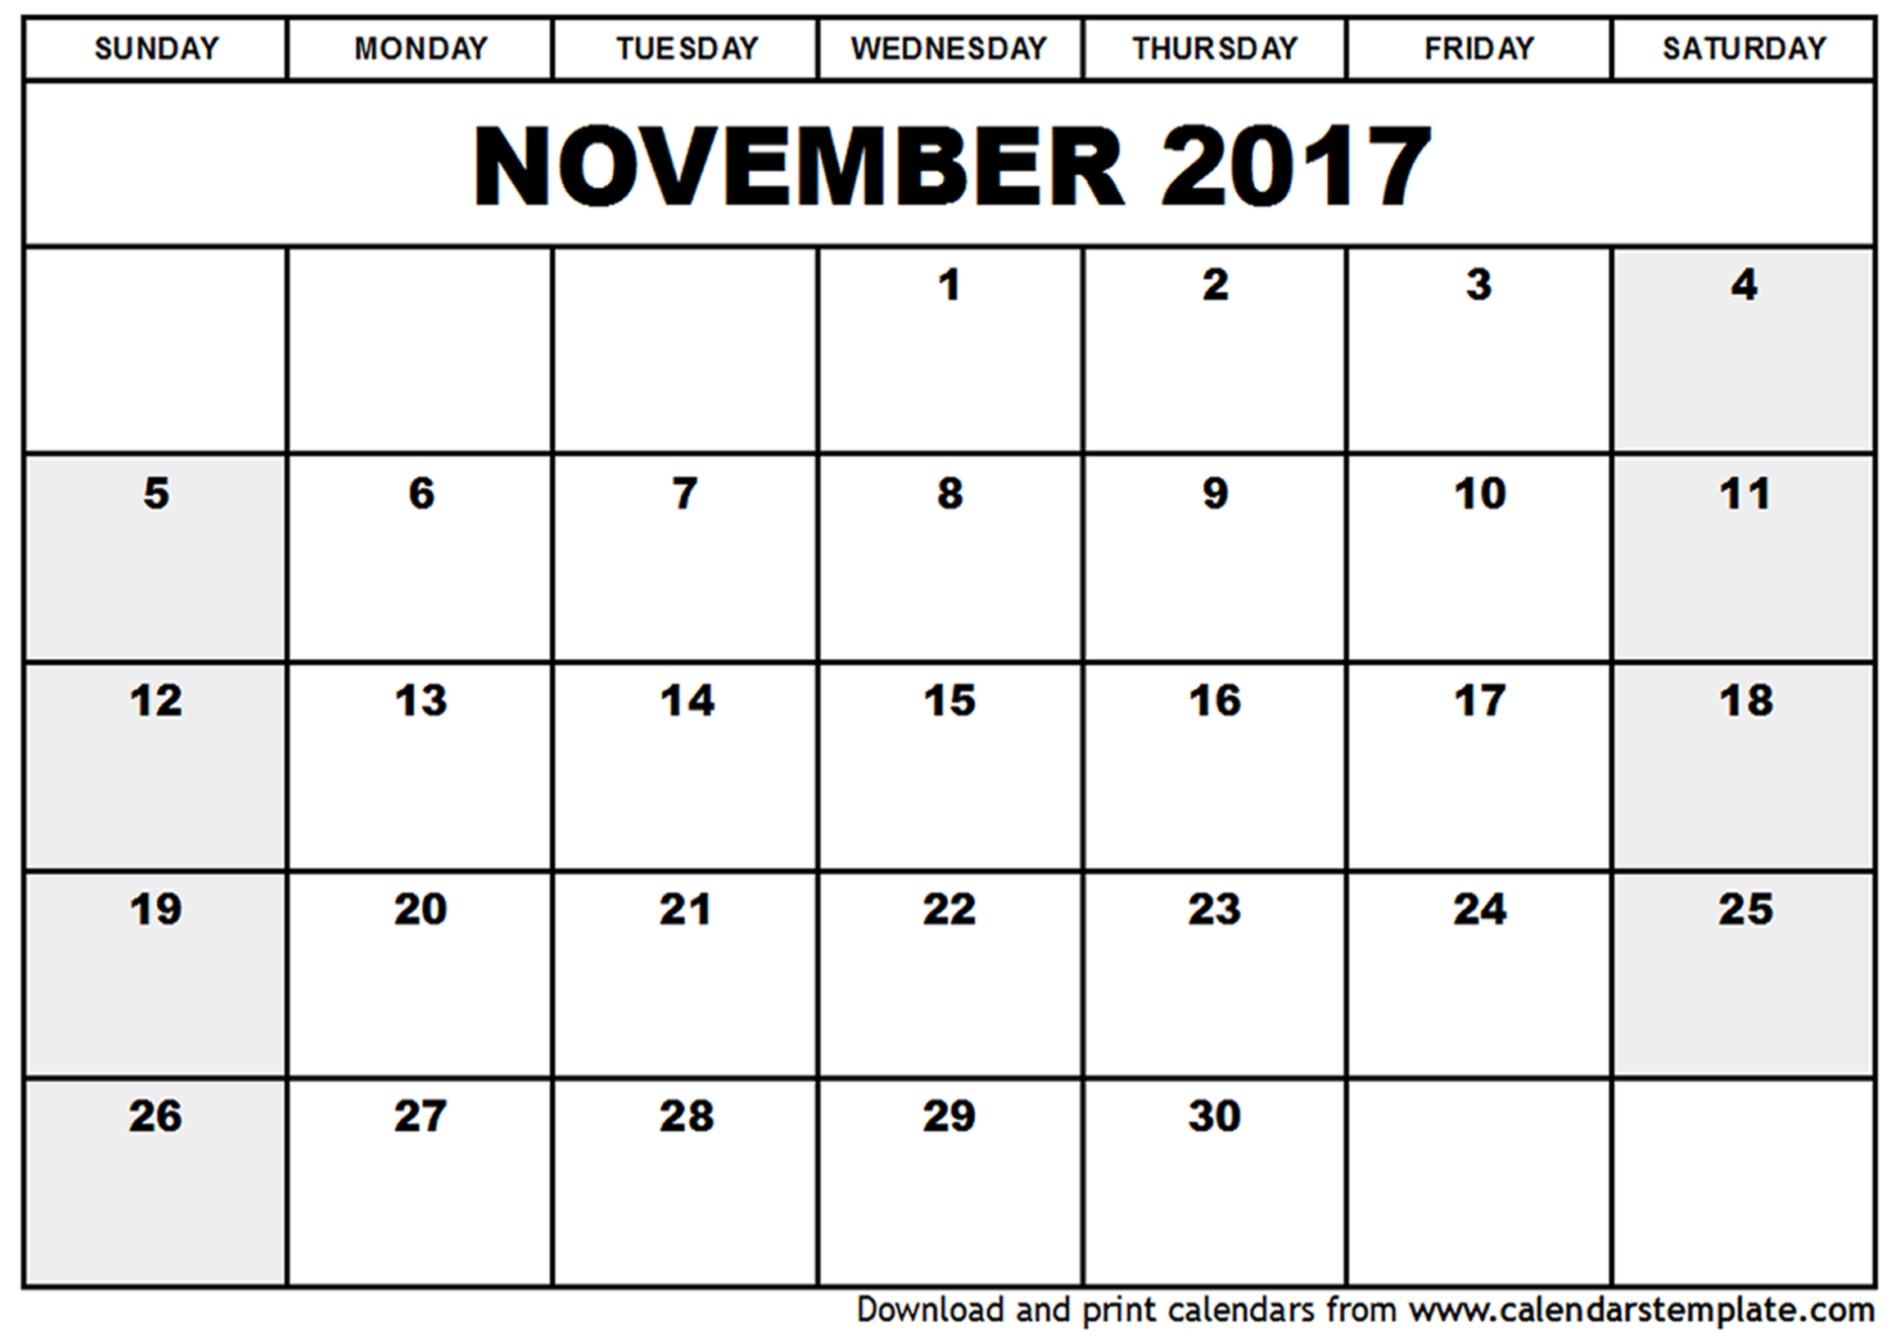 November 2017 Calendar Cute | weekly calendar template